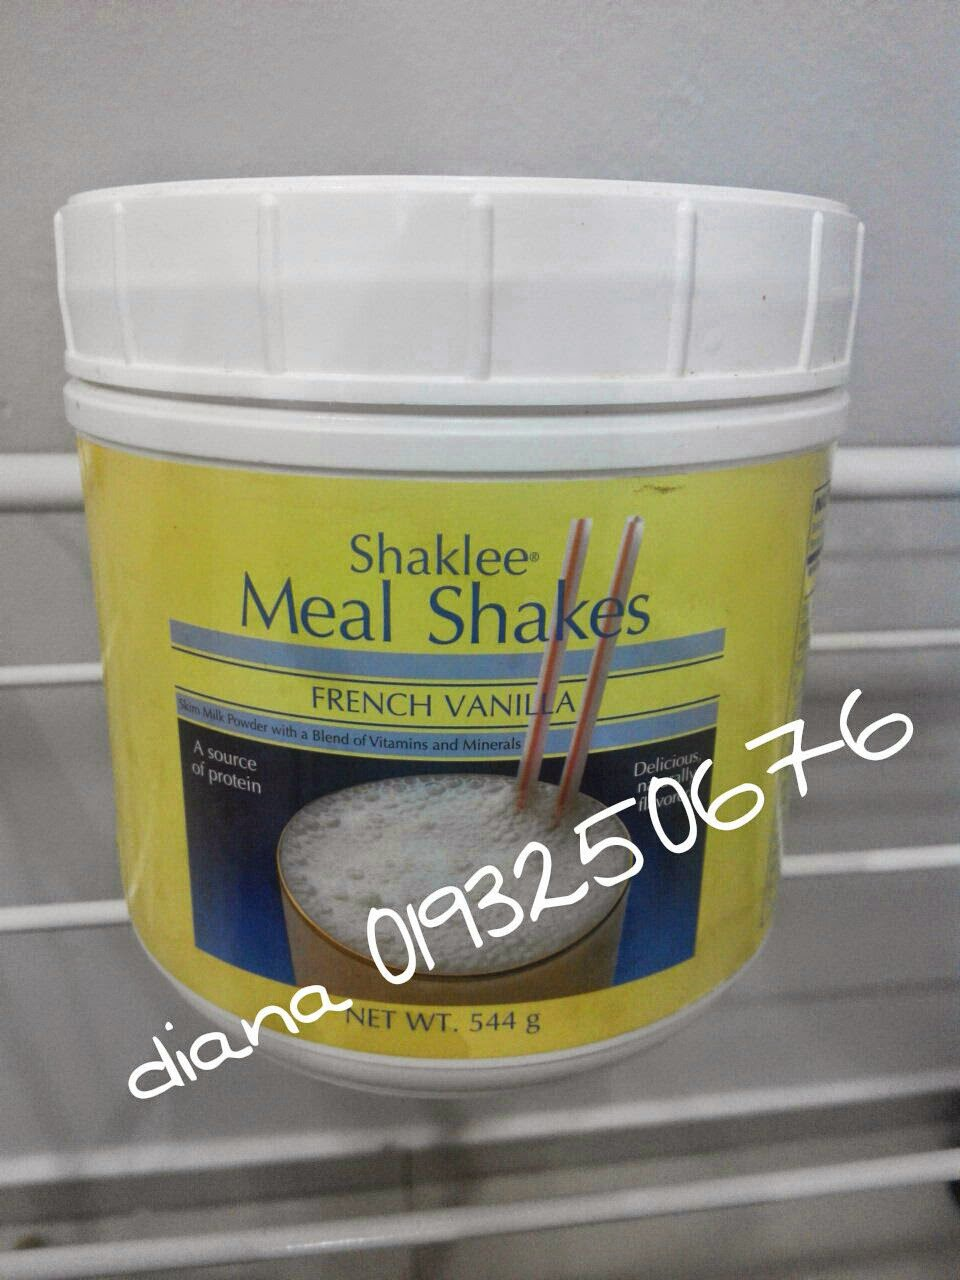 Tujuh kehebatan meal shakes